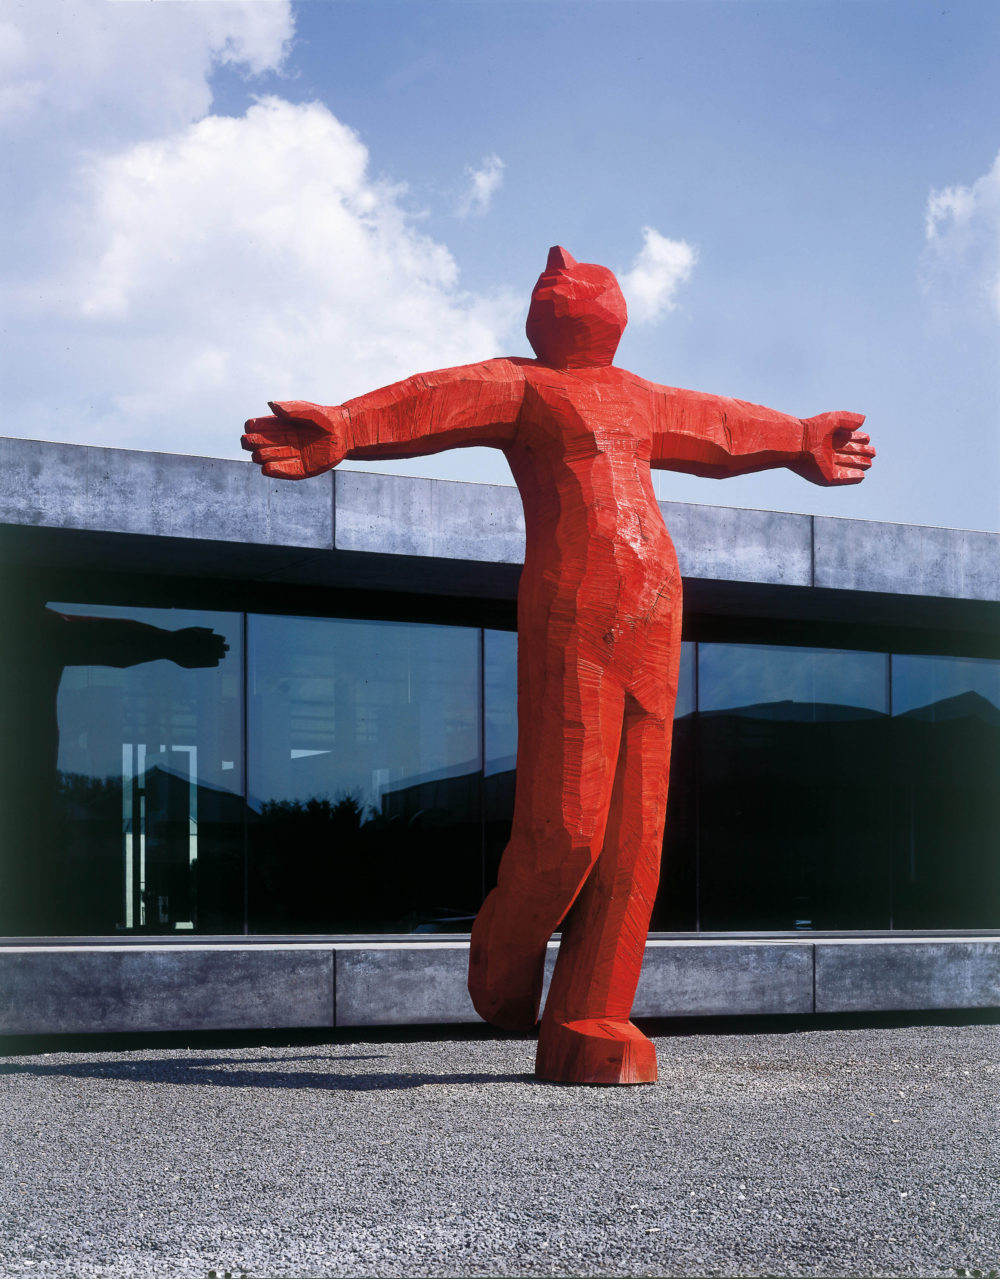 Josef Lang, Louis, Eiche, rot lasiert, Foto: Siegfried Wameser